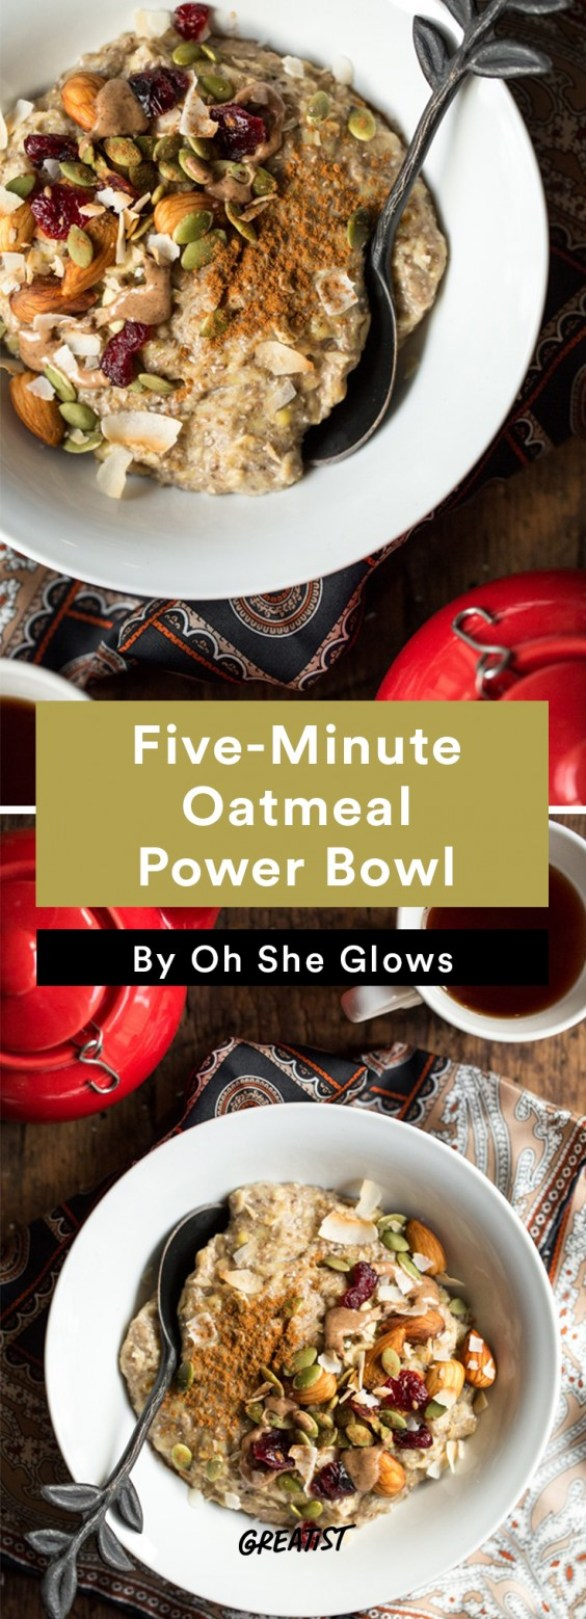 oh she glows bowl: Oatmeal Power Bowl